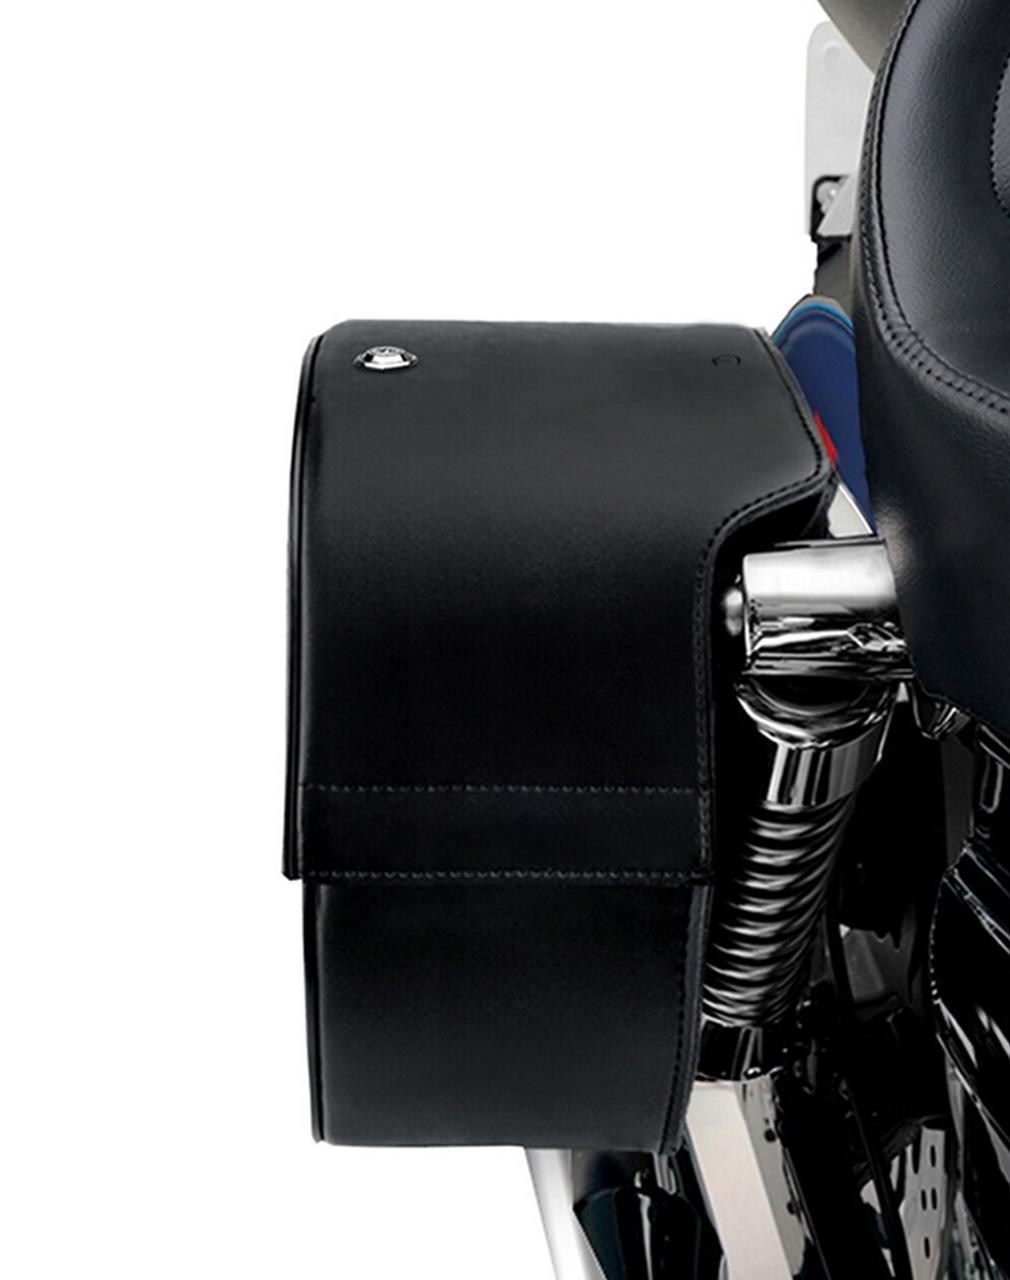 Honda VTX 1800 N Single Strap Shock Cutout Slanted Large Motorcycle Saddlebags Shock Cutout View